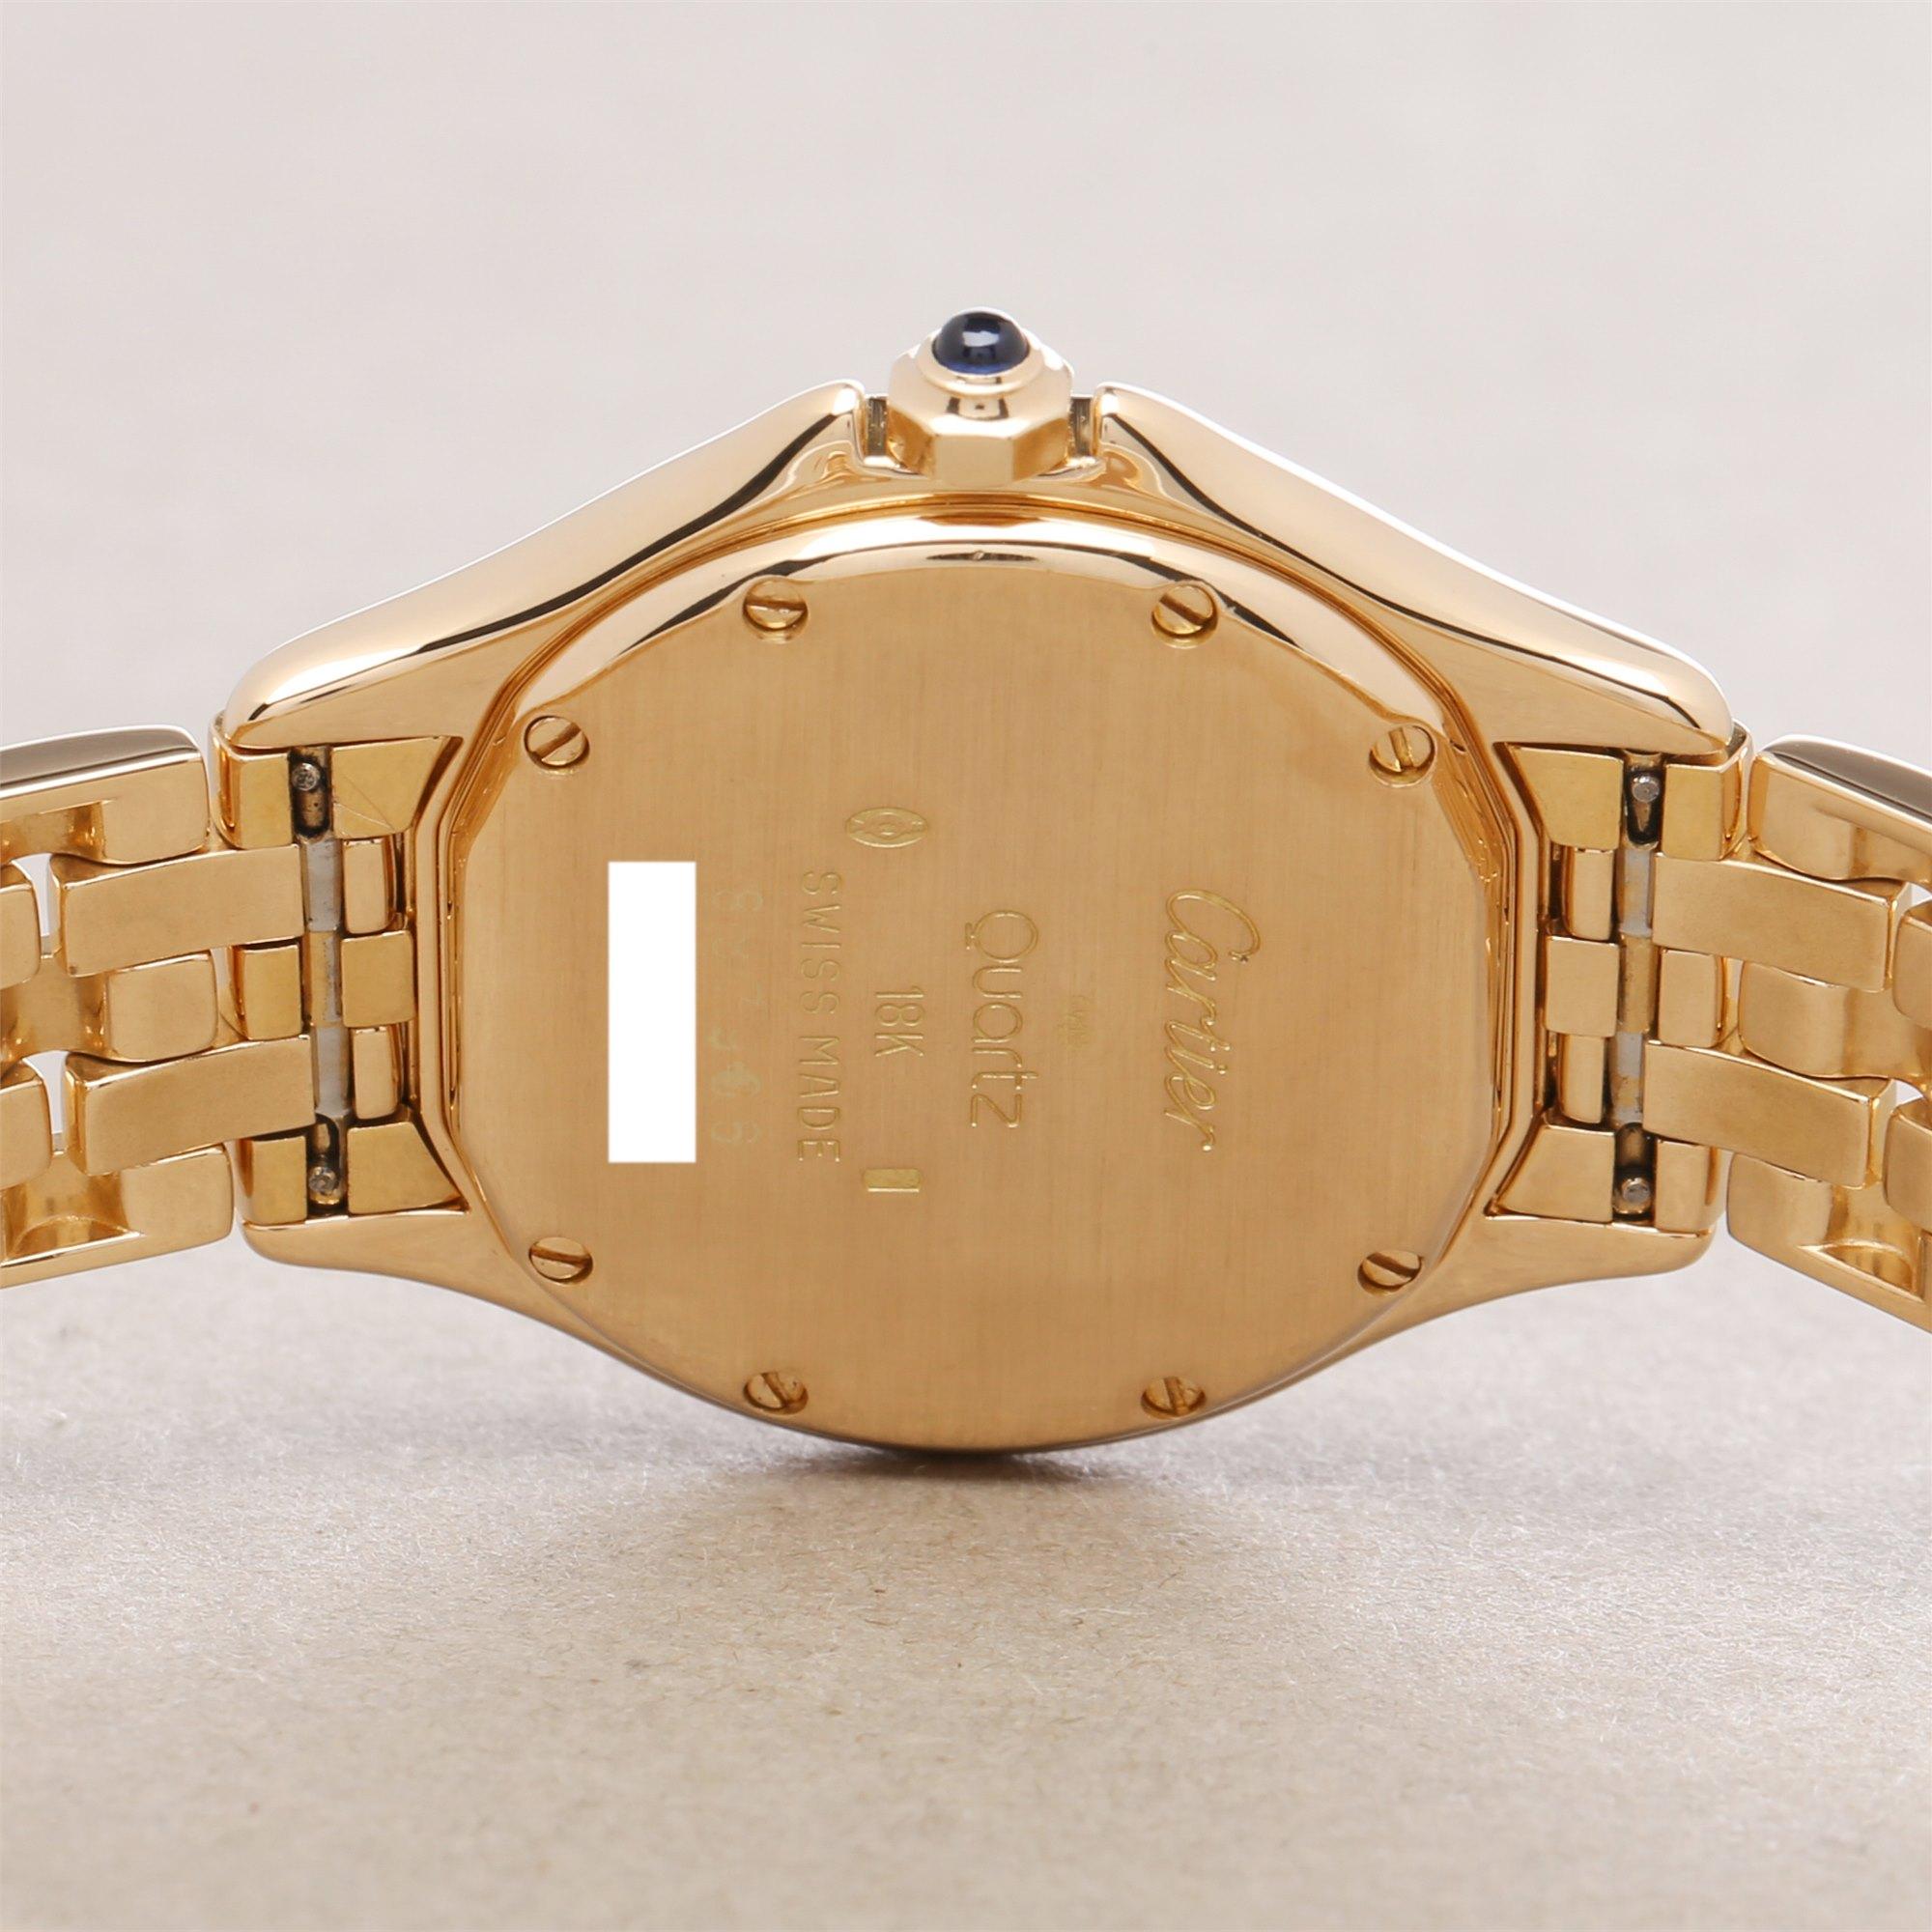 Cartier Panthere Cougar 18K Yellow Gold 887904